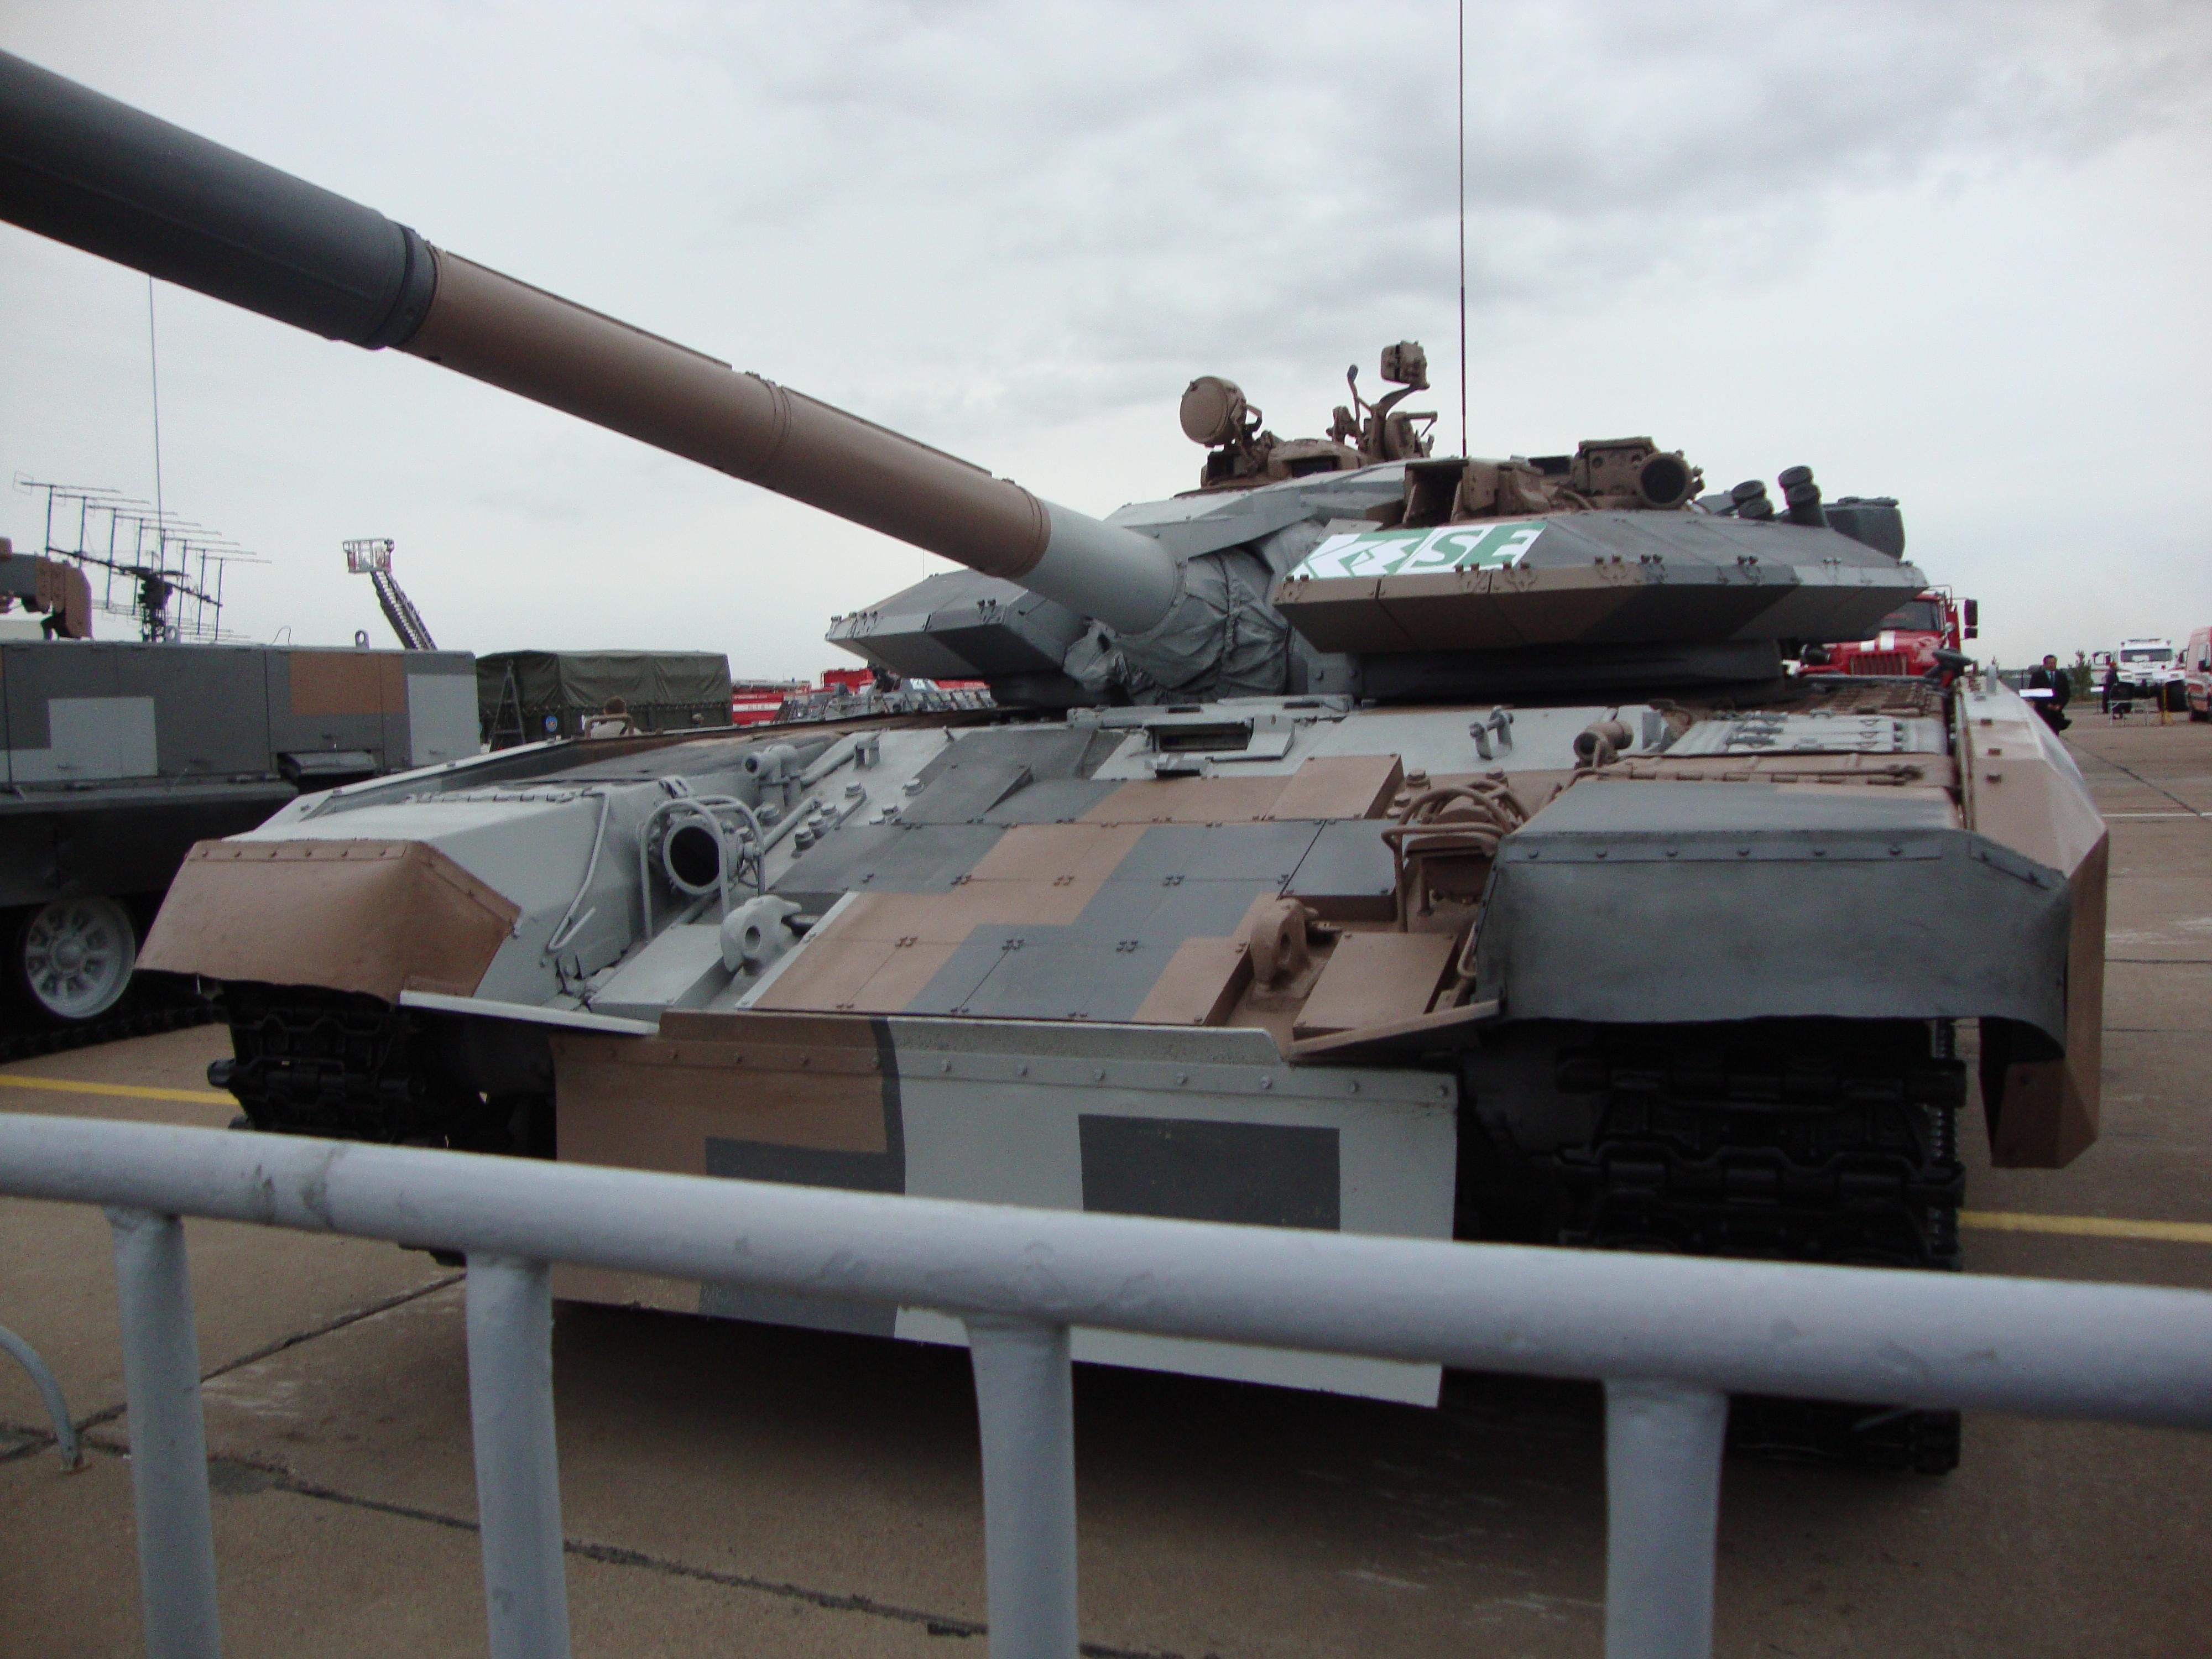 T-72 ΜΒΤ modernisation and variants - Page 7 F6VSE